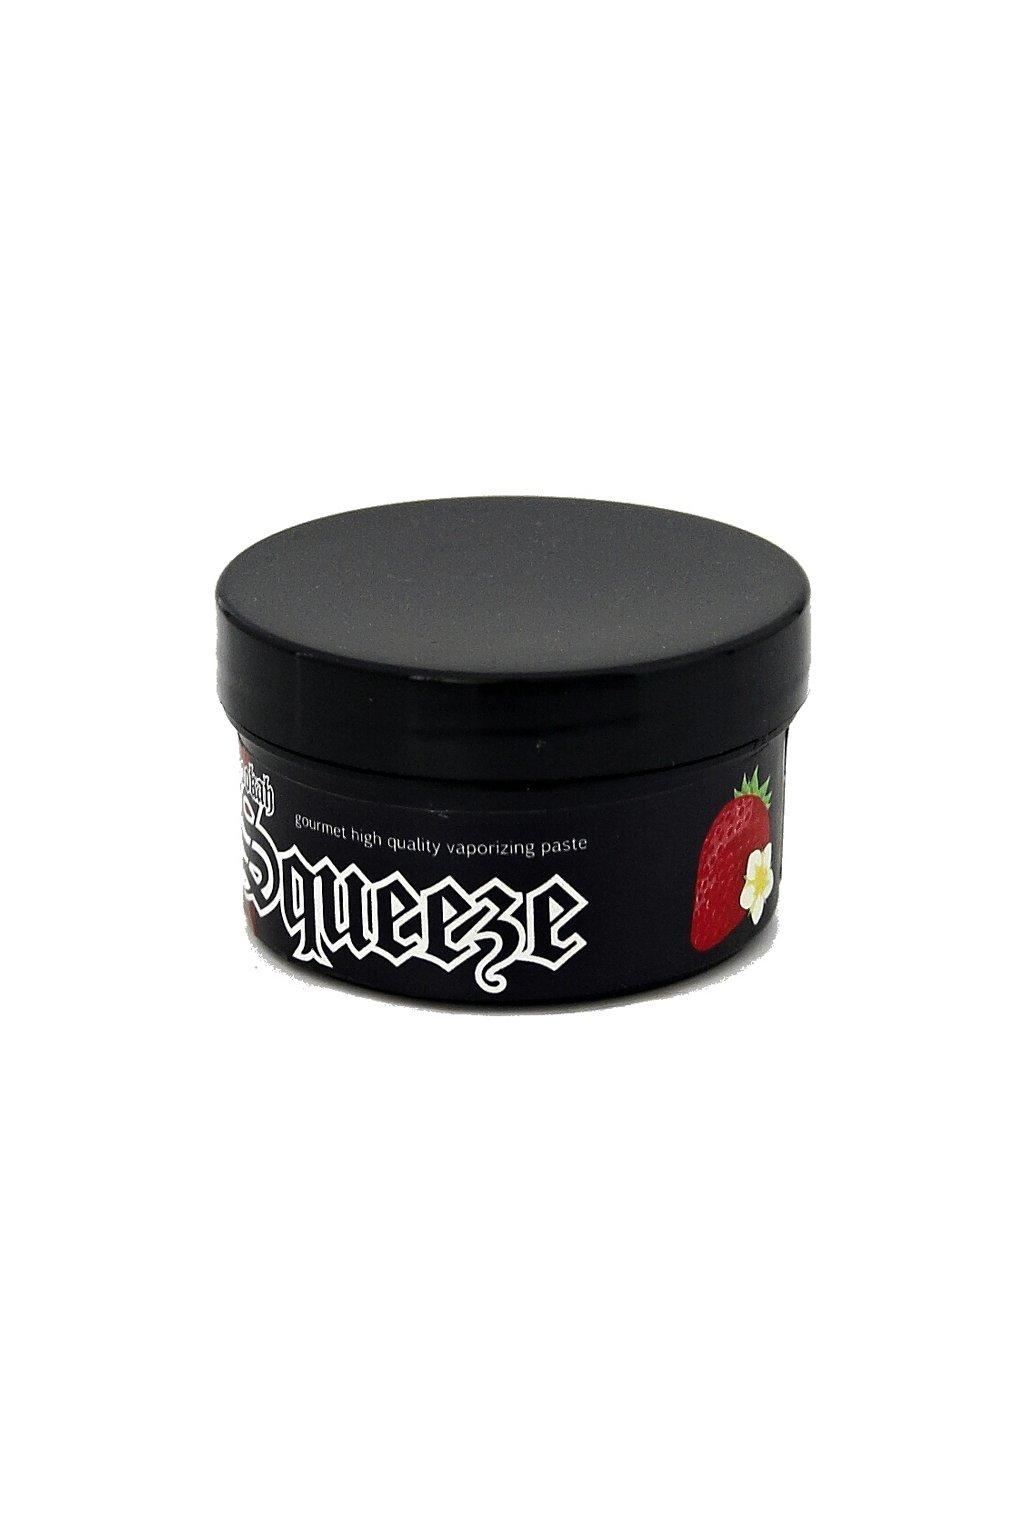 hookahSqueeze Vapor Paste 050 g Strawberry